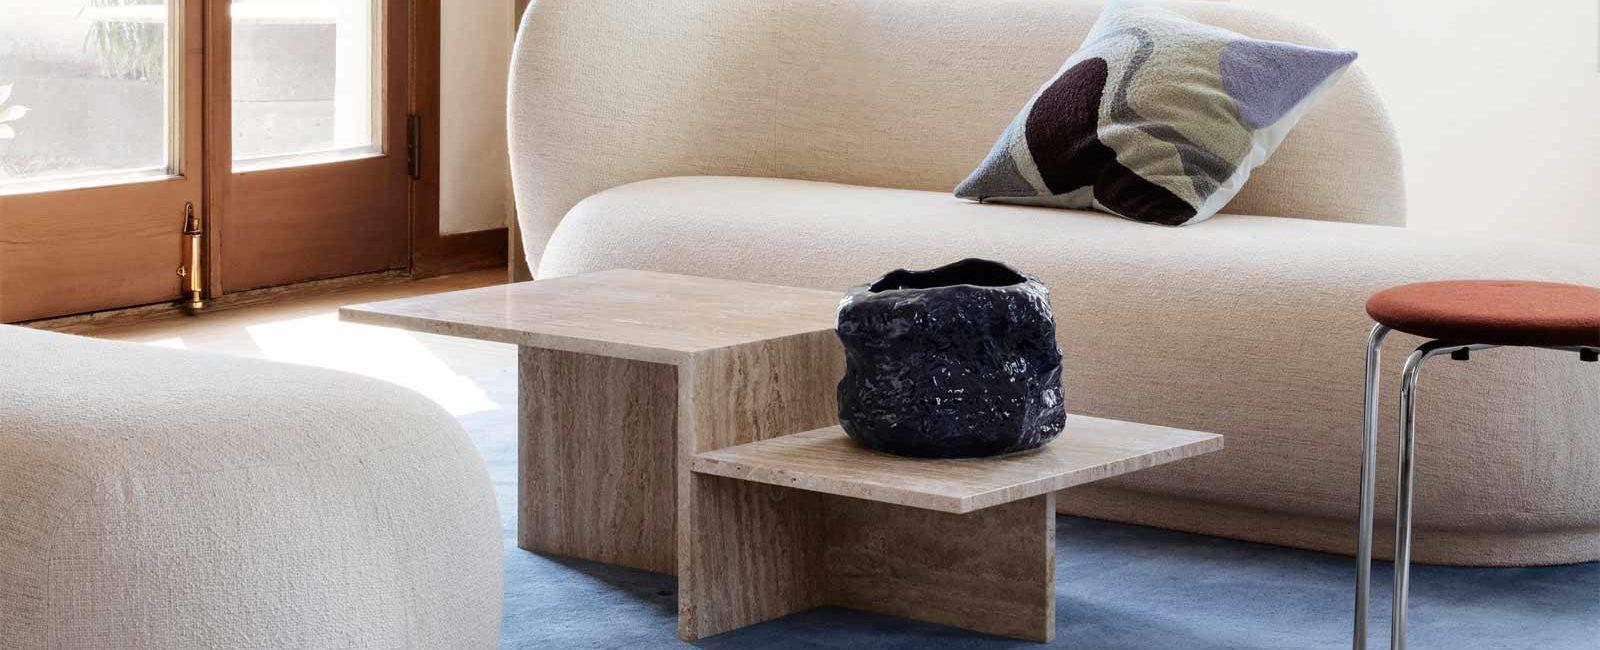 Mesas con formas escultóricas